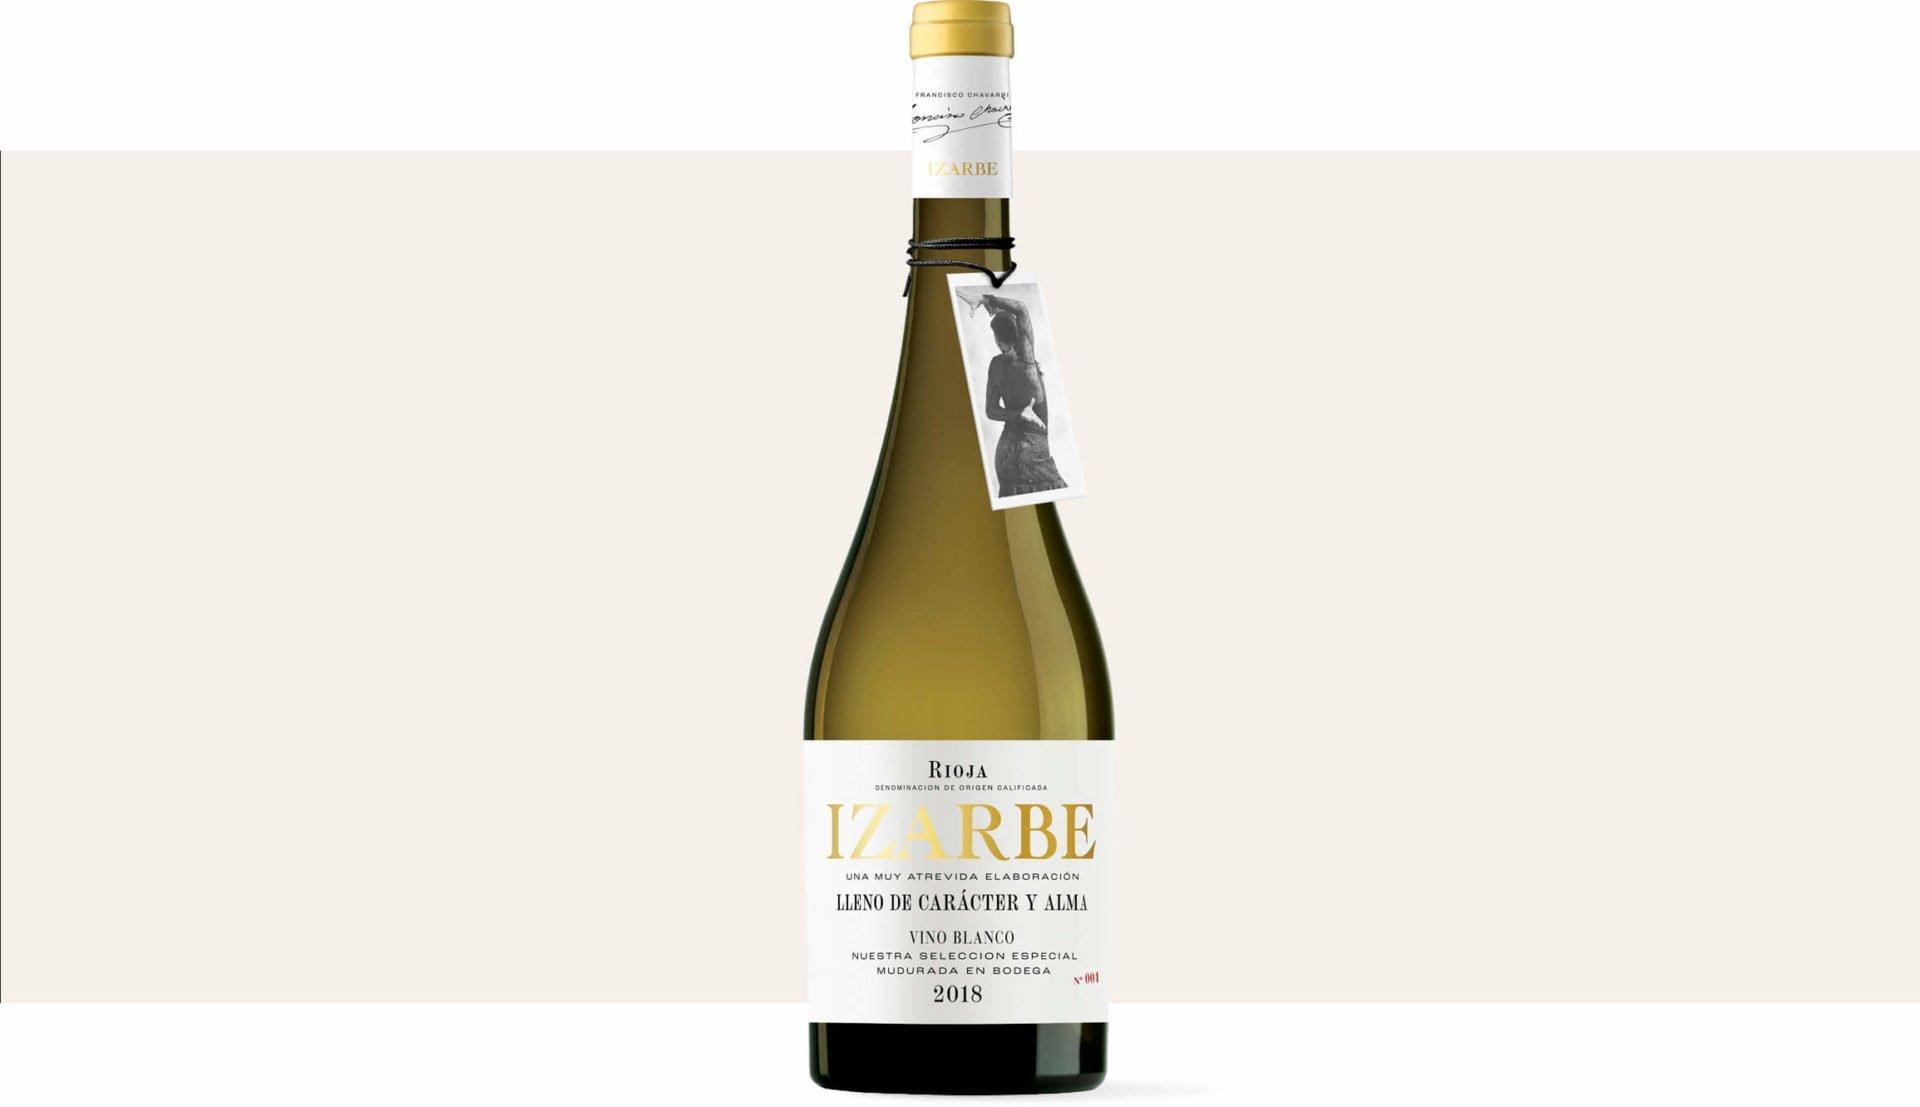 packaging-diseño-etiqueta-vino-izarbe-blanco-bodegas-familia-chavarri